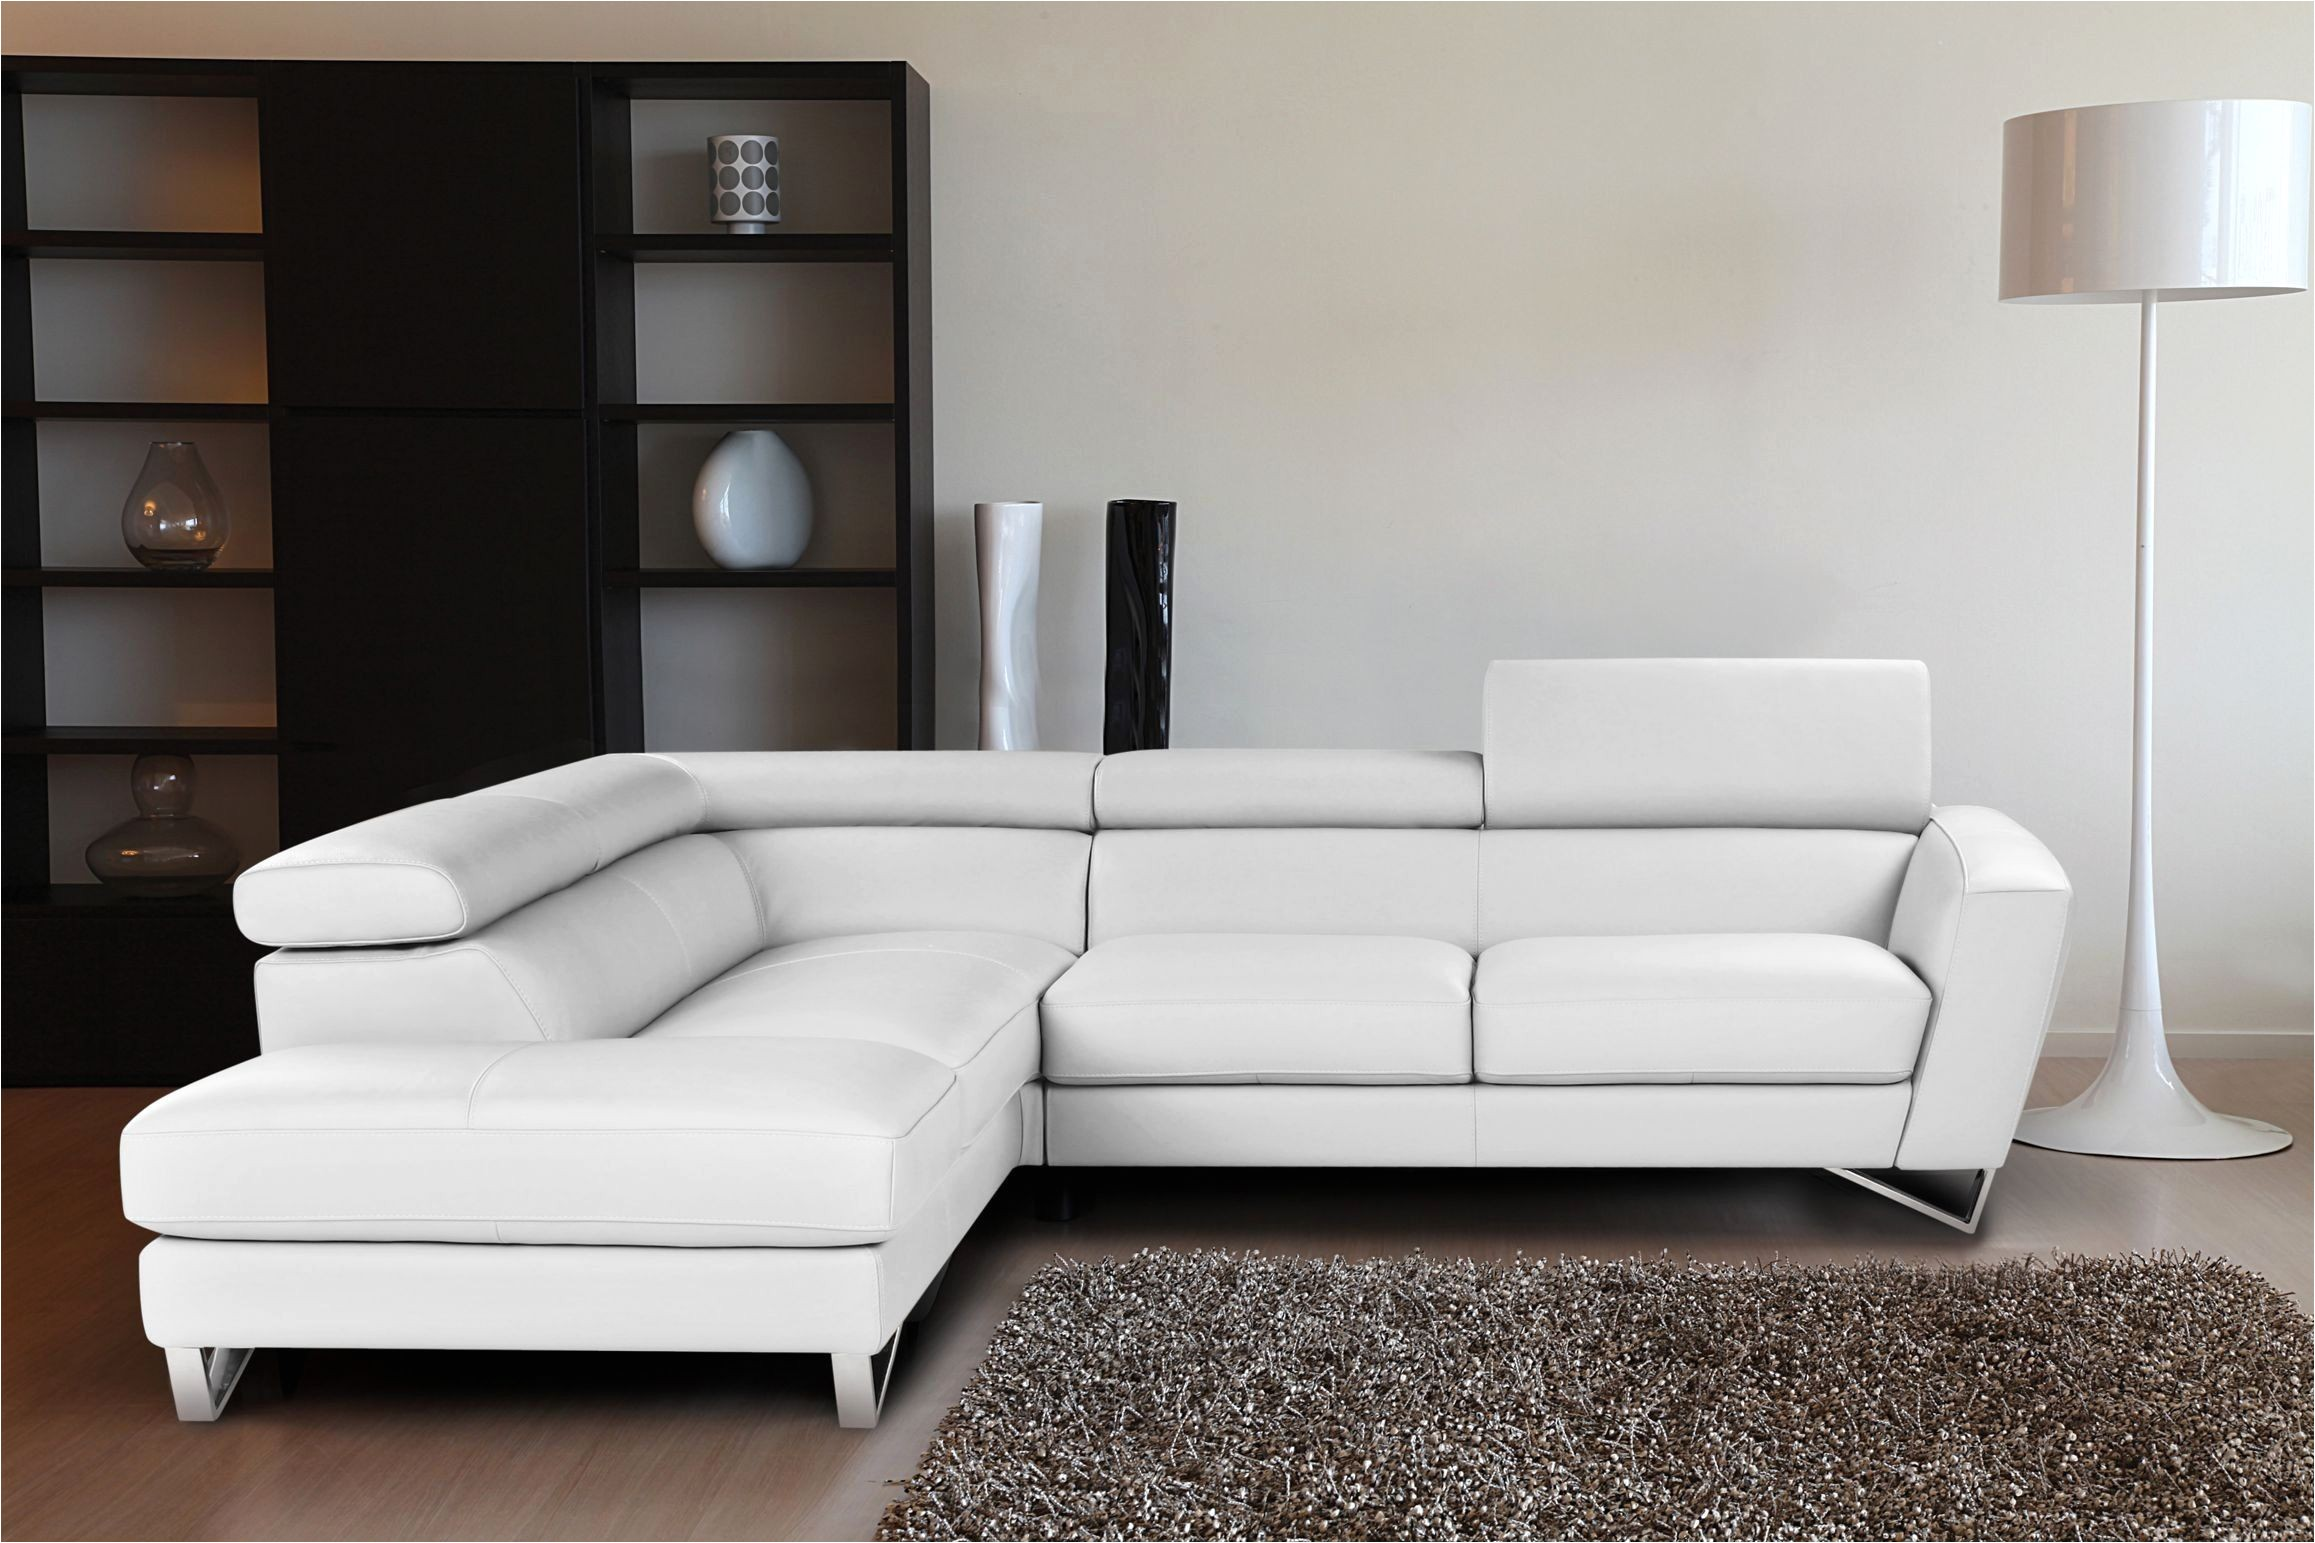 inspirational contemporary italian sofas image contemporary italian sofas elegant brown italian leather sectional sofa contemporary black